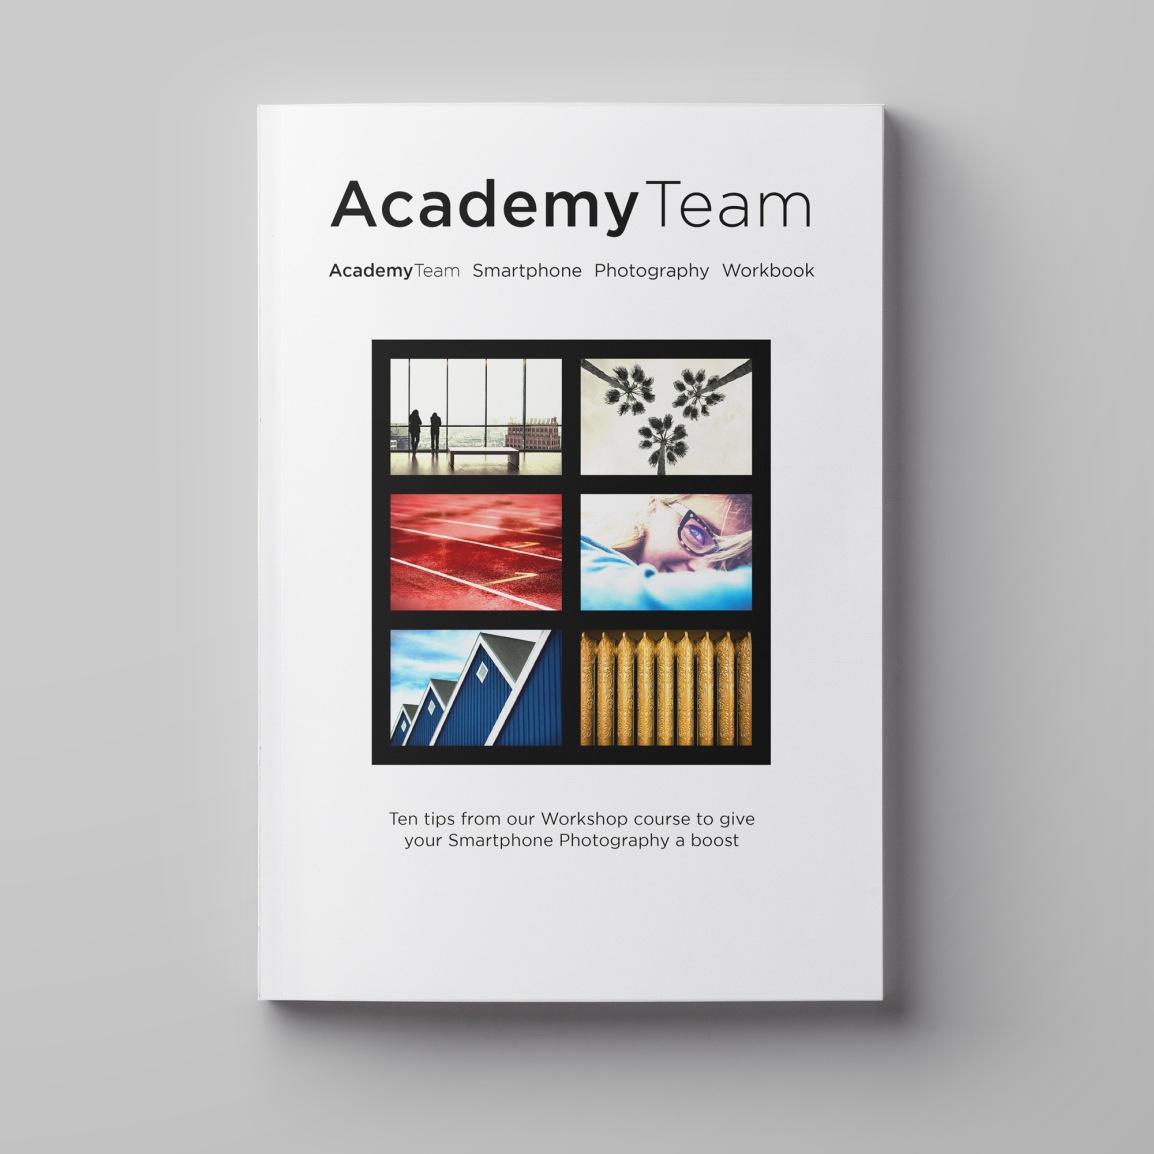 AcademyTeam Smartphone Photography Workshop Workbook